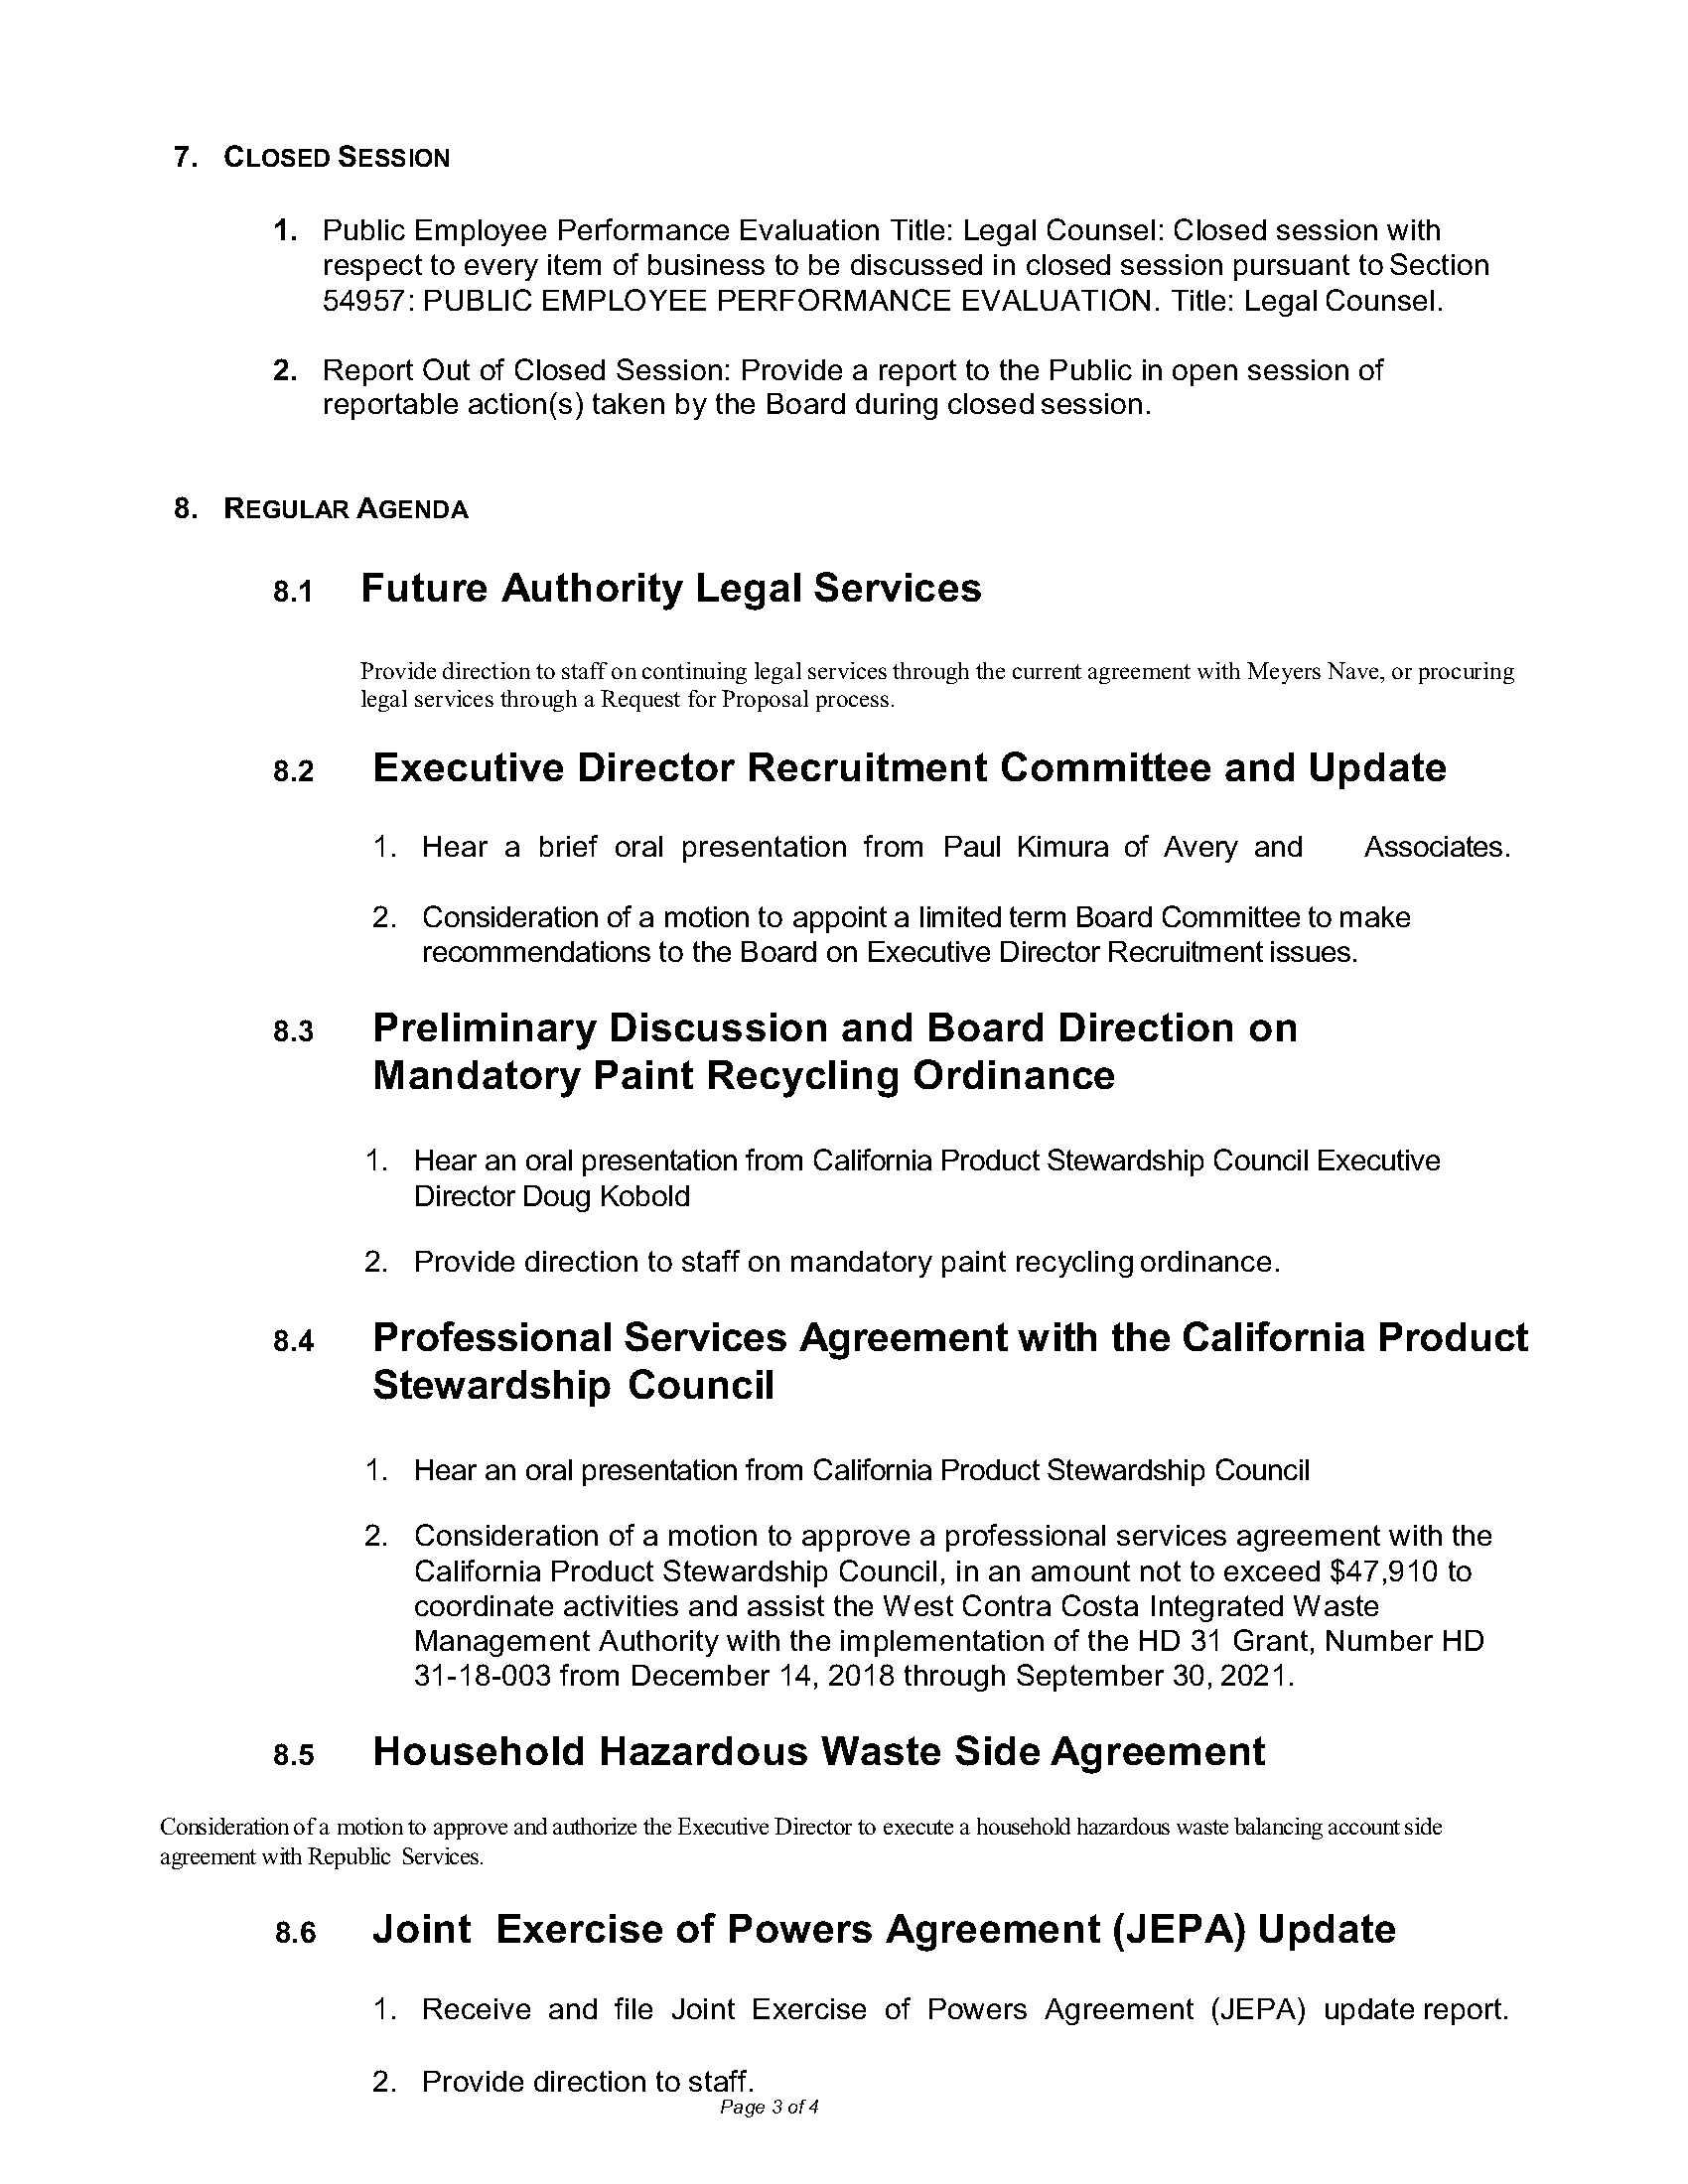 ESMAC Agenda 12.13.2018 (51 Pages)_46.jpg